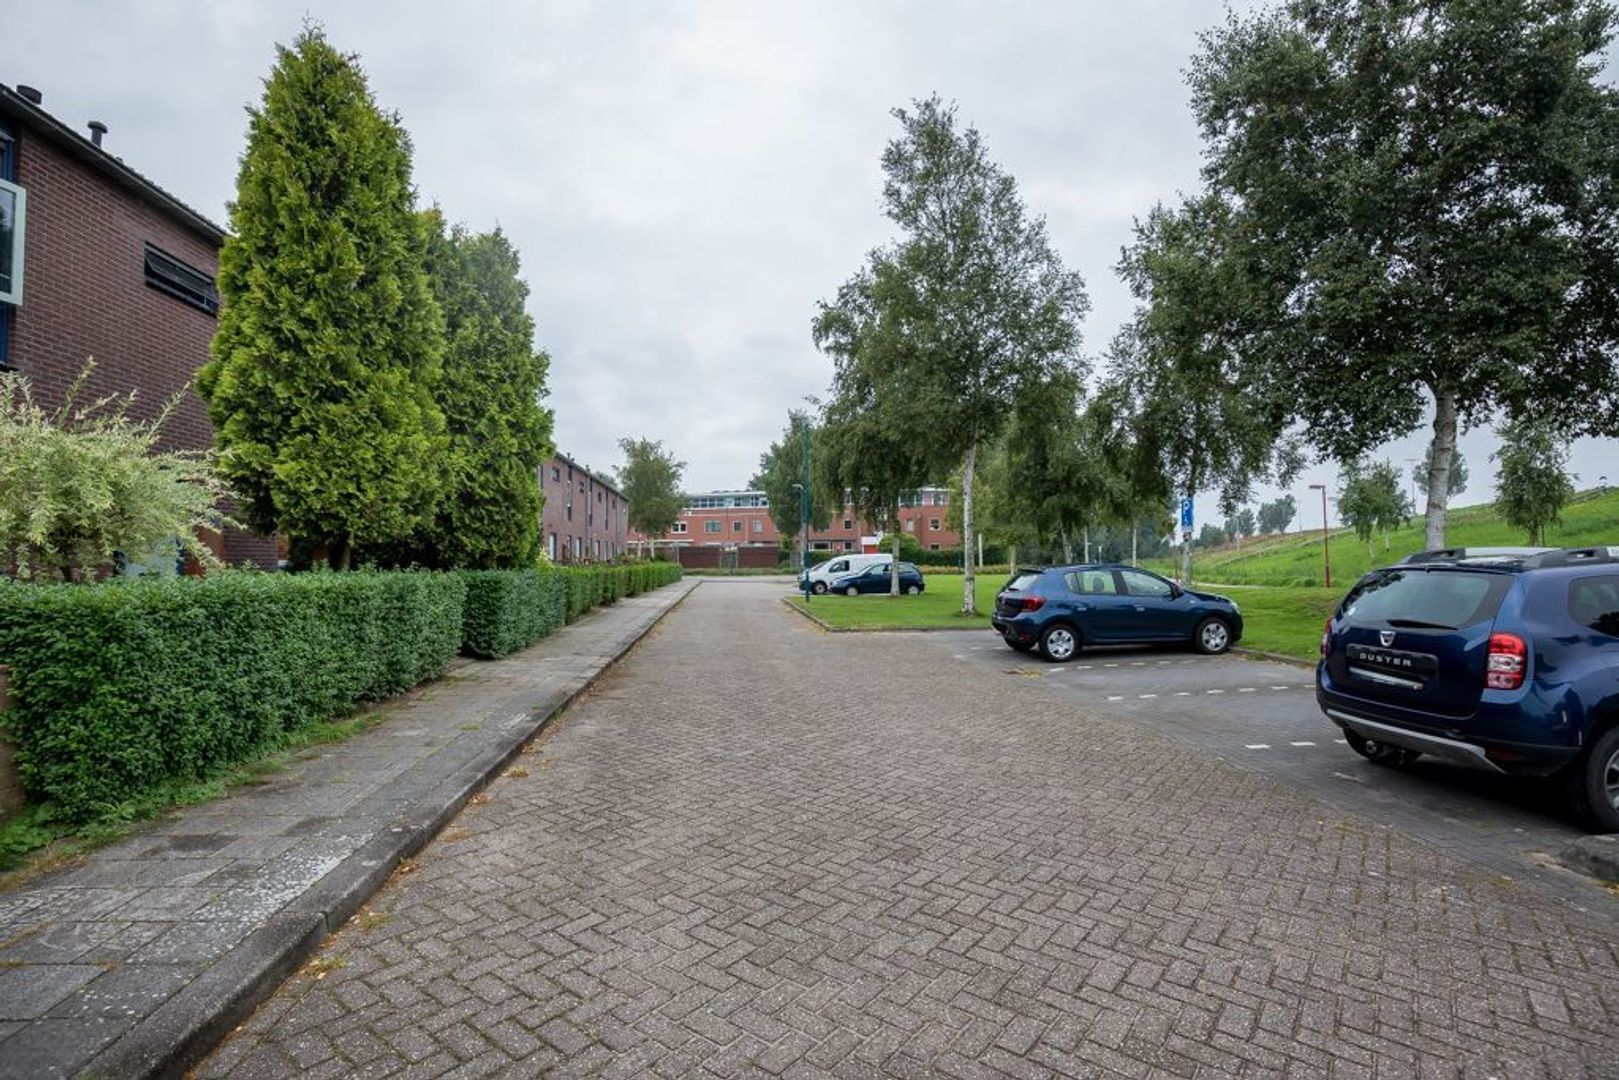 Balsahout 15, Zoetermeer foto-36